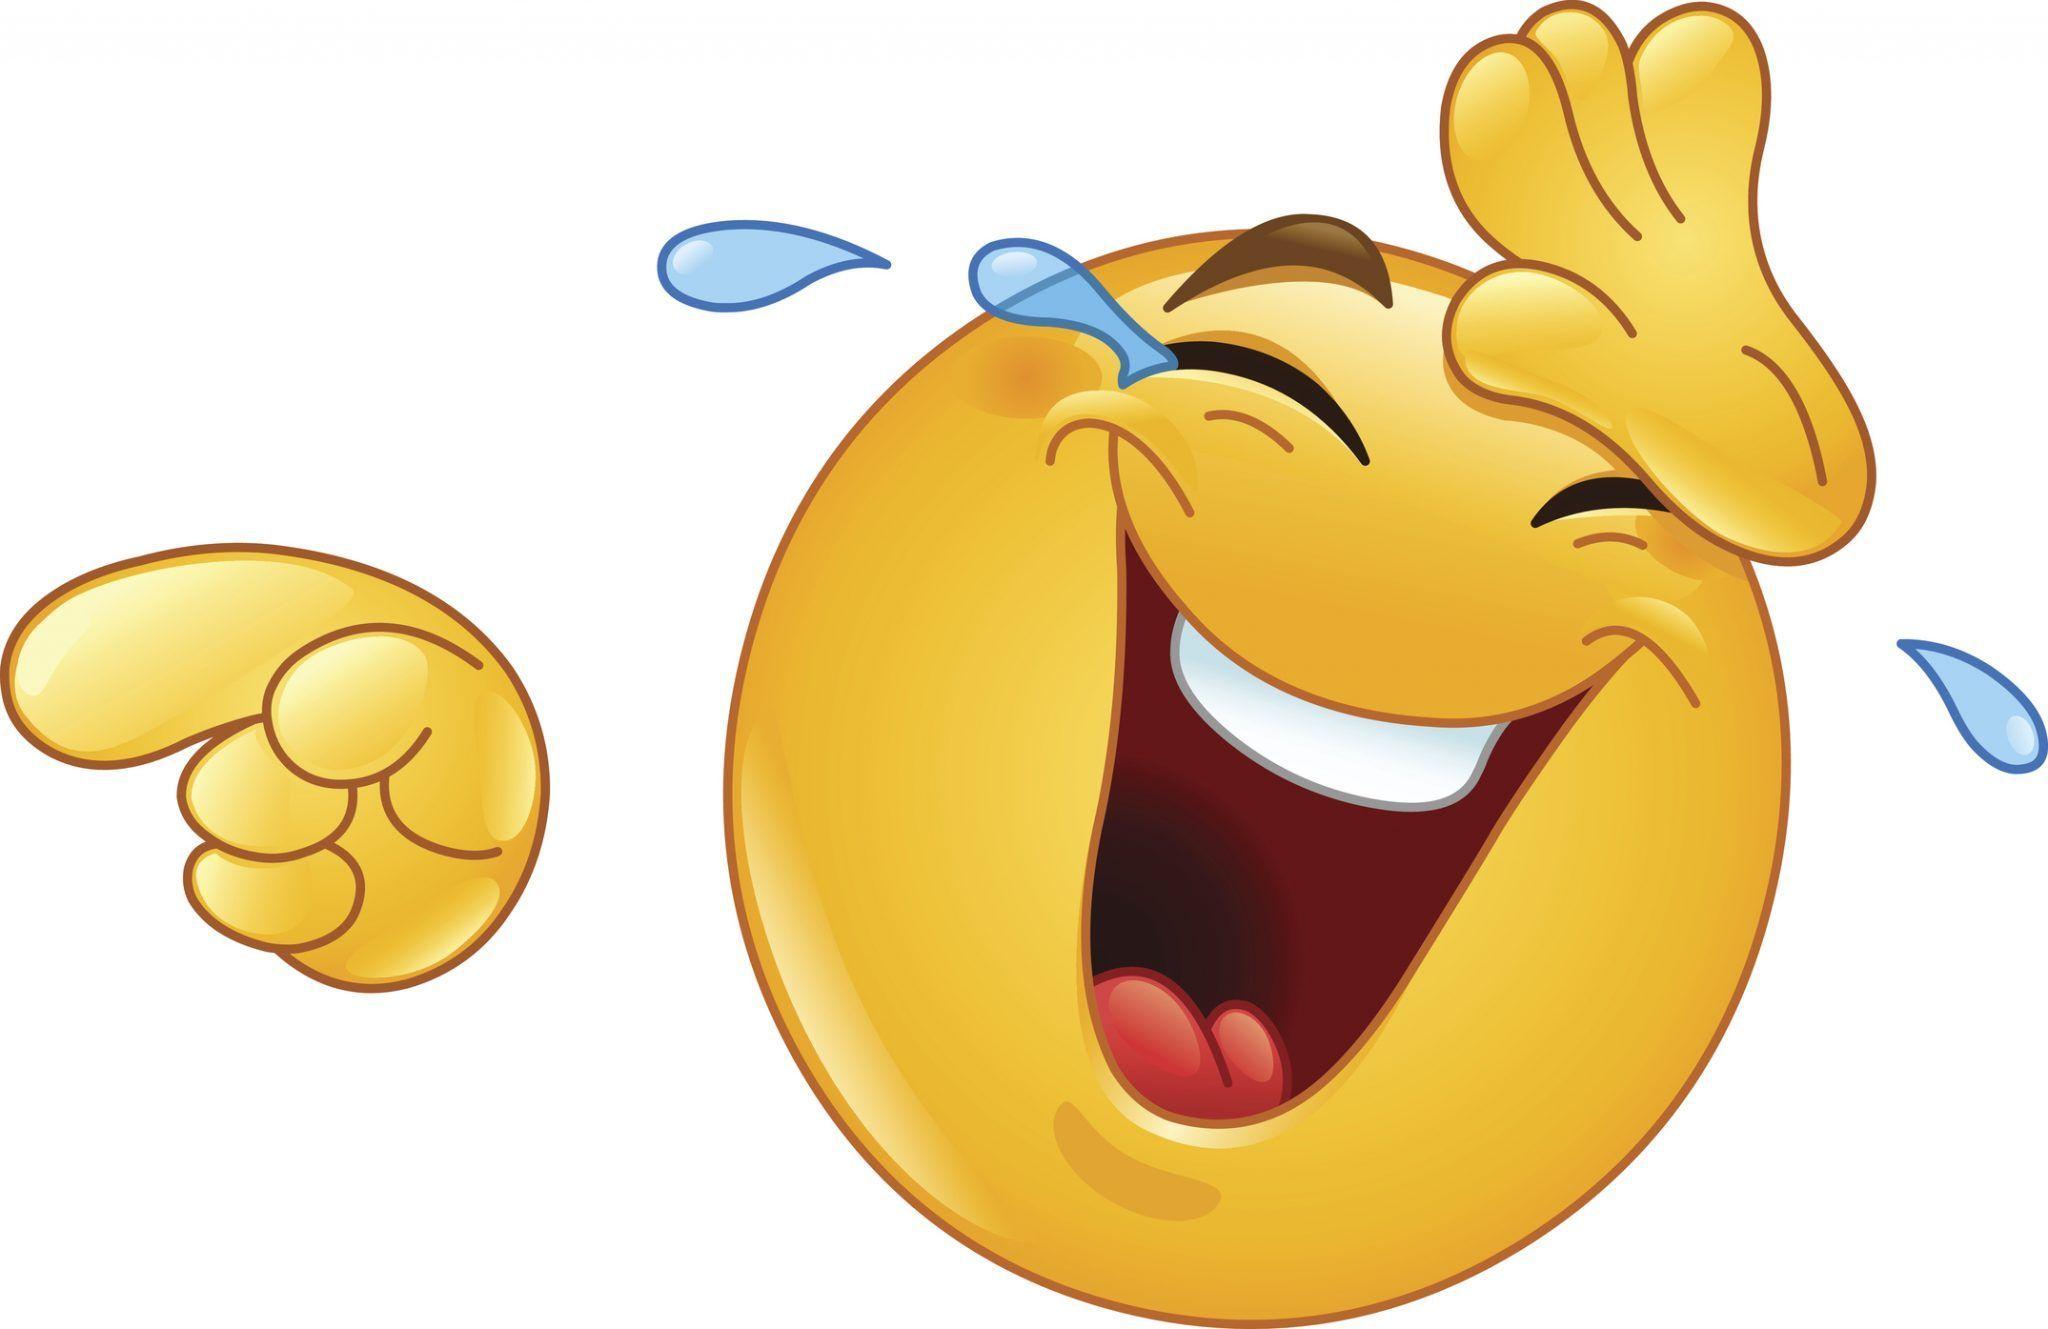 4000 Gambar Emoticon Ngakak Paling Keren Gambar Lucu Cerita Lucu Smiley